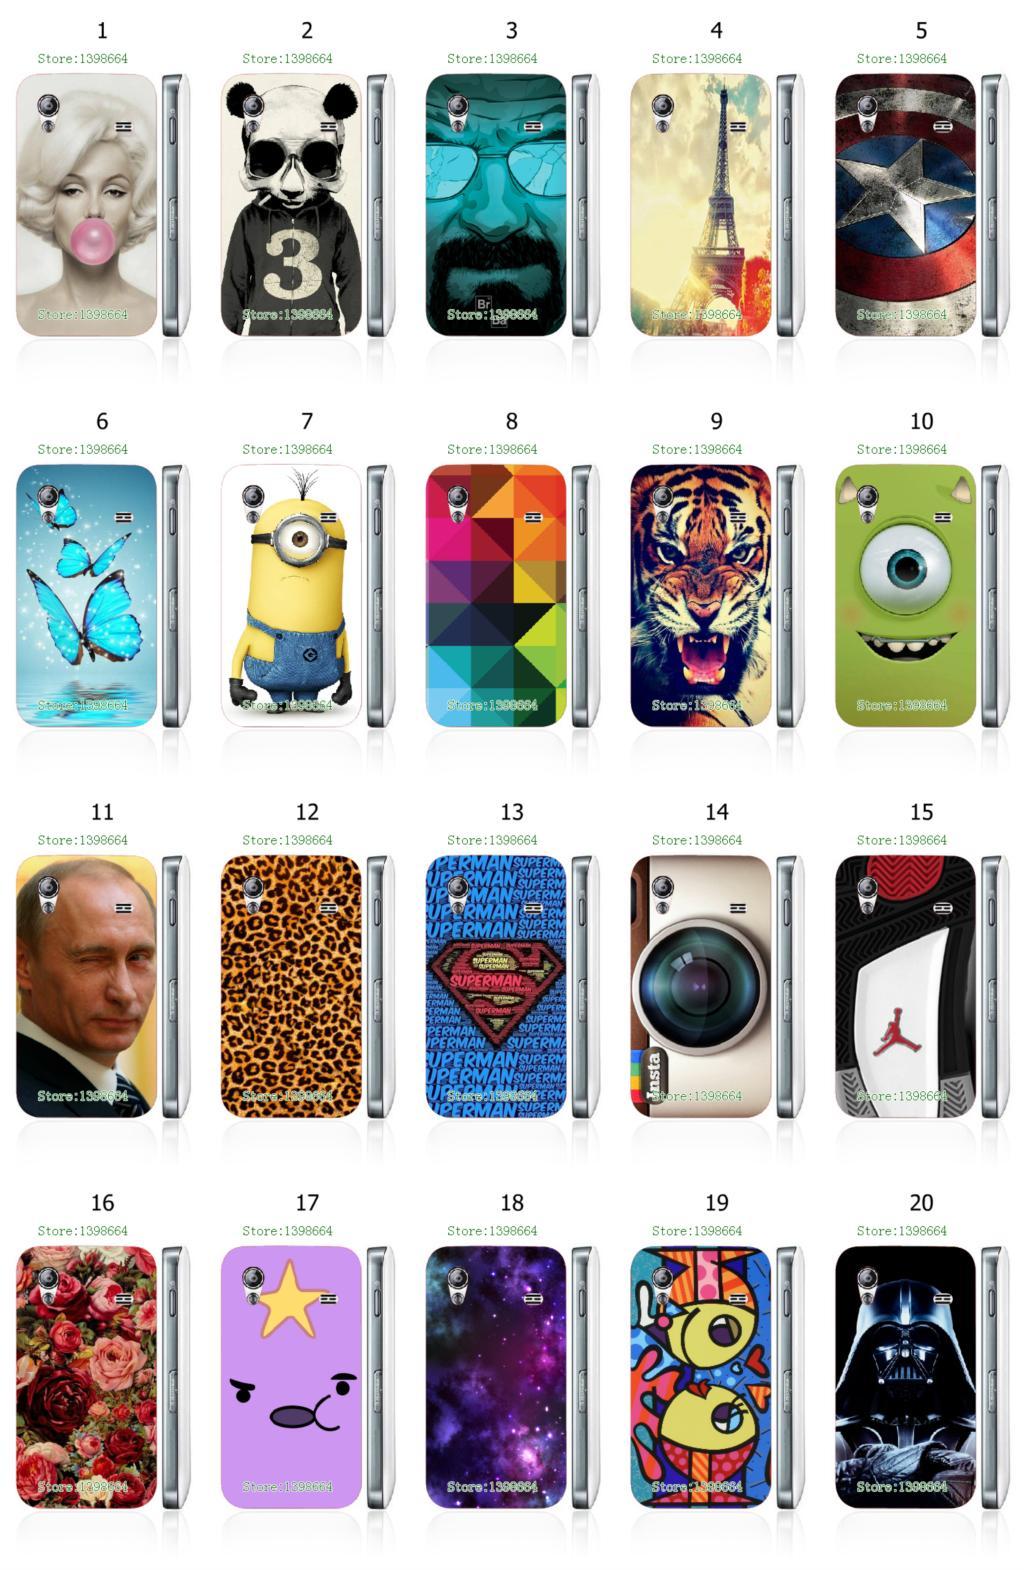 cartoon tiger flower putin designs white hard case cover samsung Galaxy Ace S5830 - Case-Manufacturer store